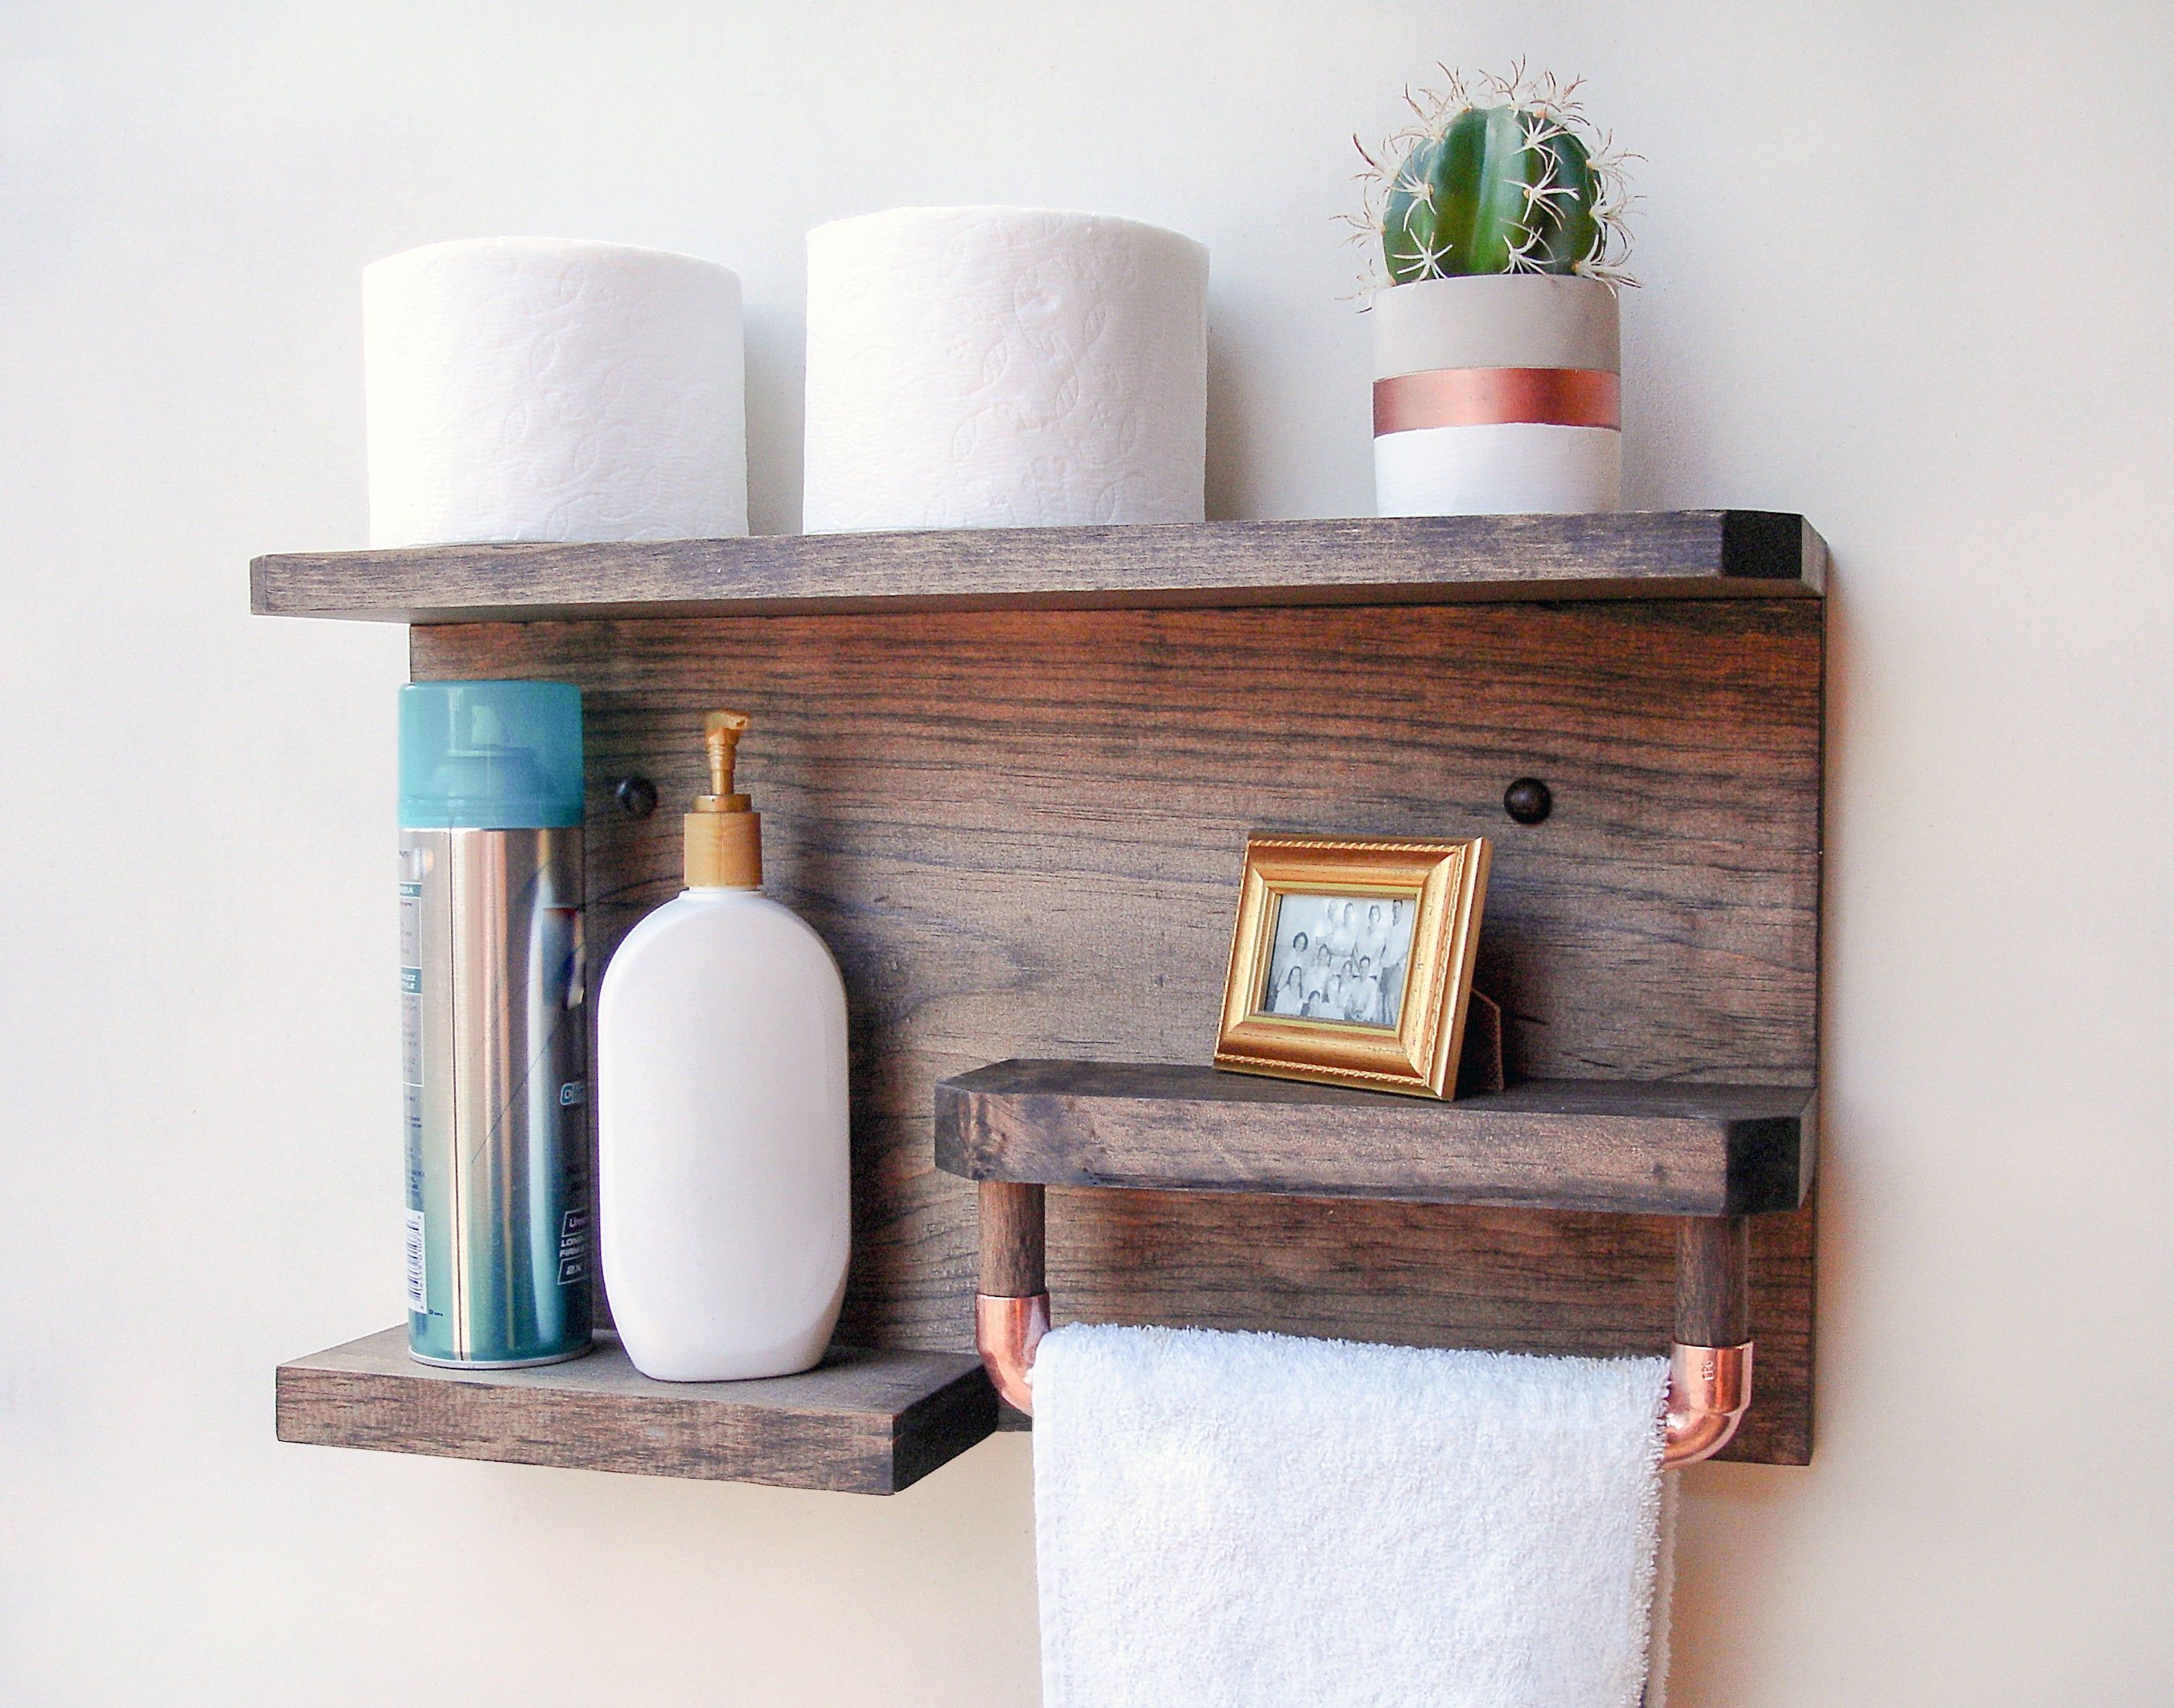 28 Bathroom Storage Shelf With Modern Towel Hooks With Images